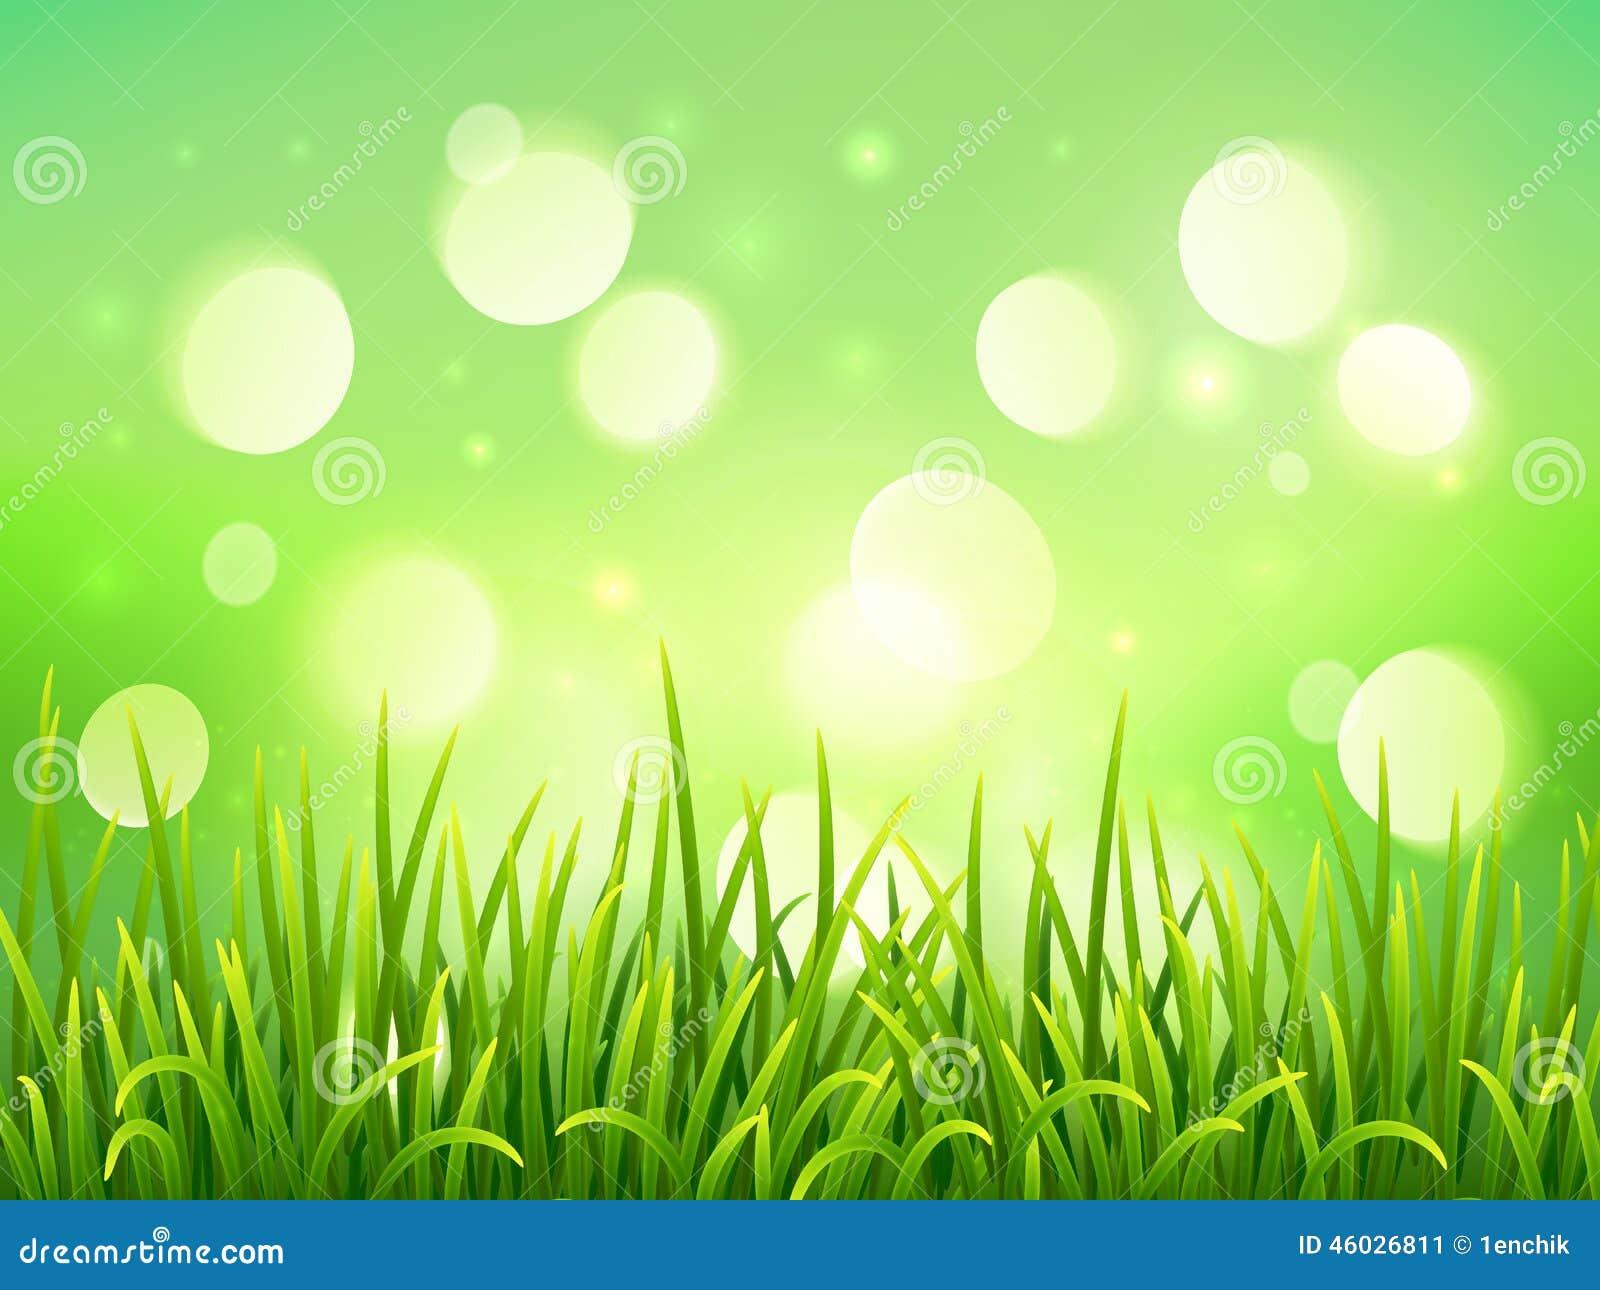 Green Grass On Bokeh Light Effect Background Stock Vector ... for Green Light Effects Background  156eri